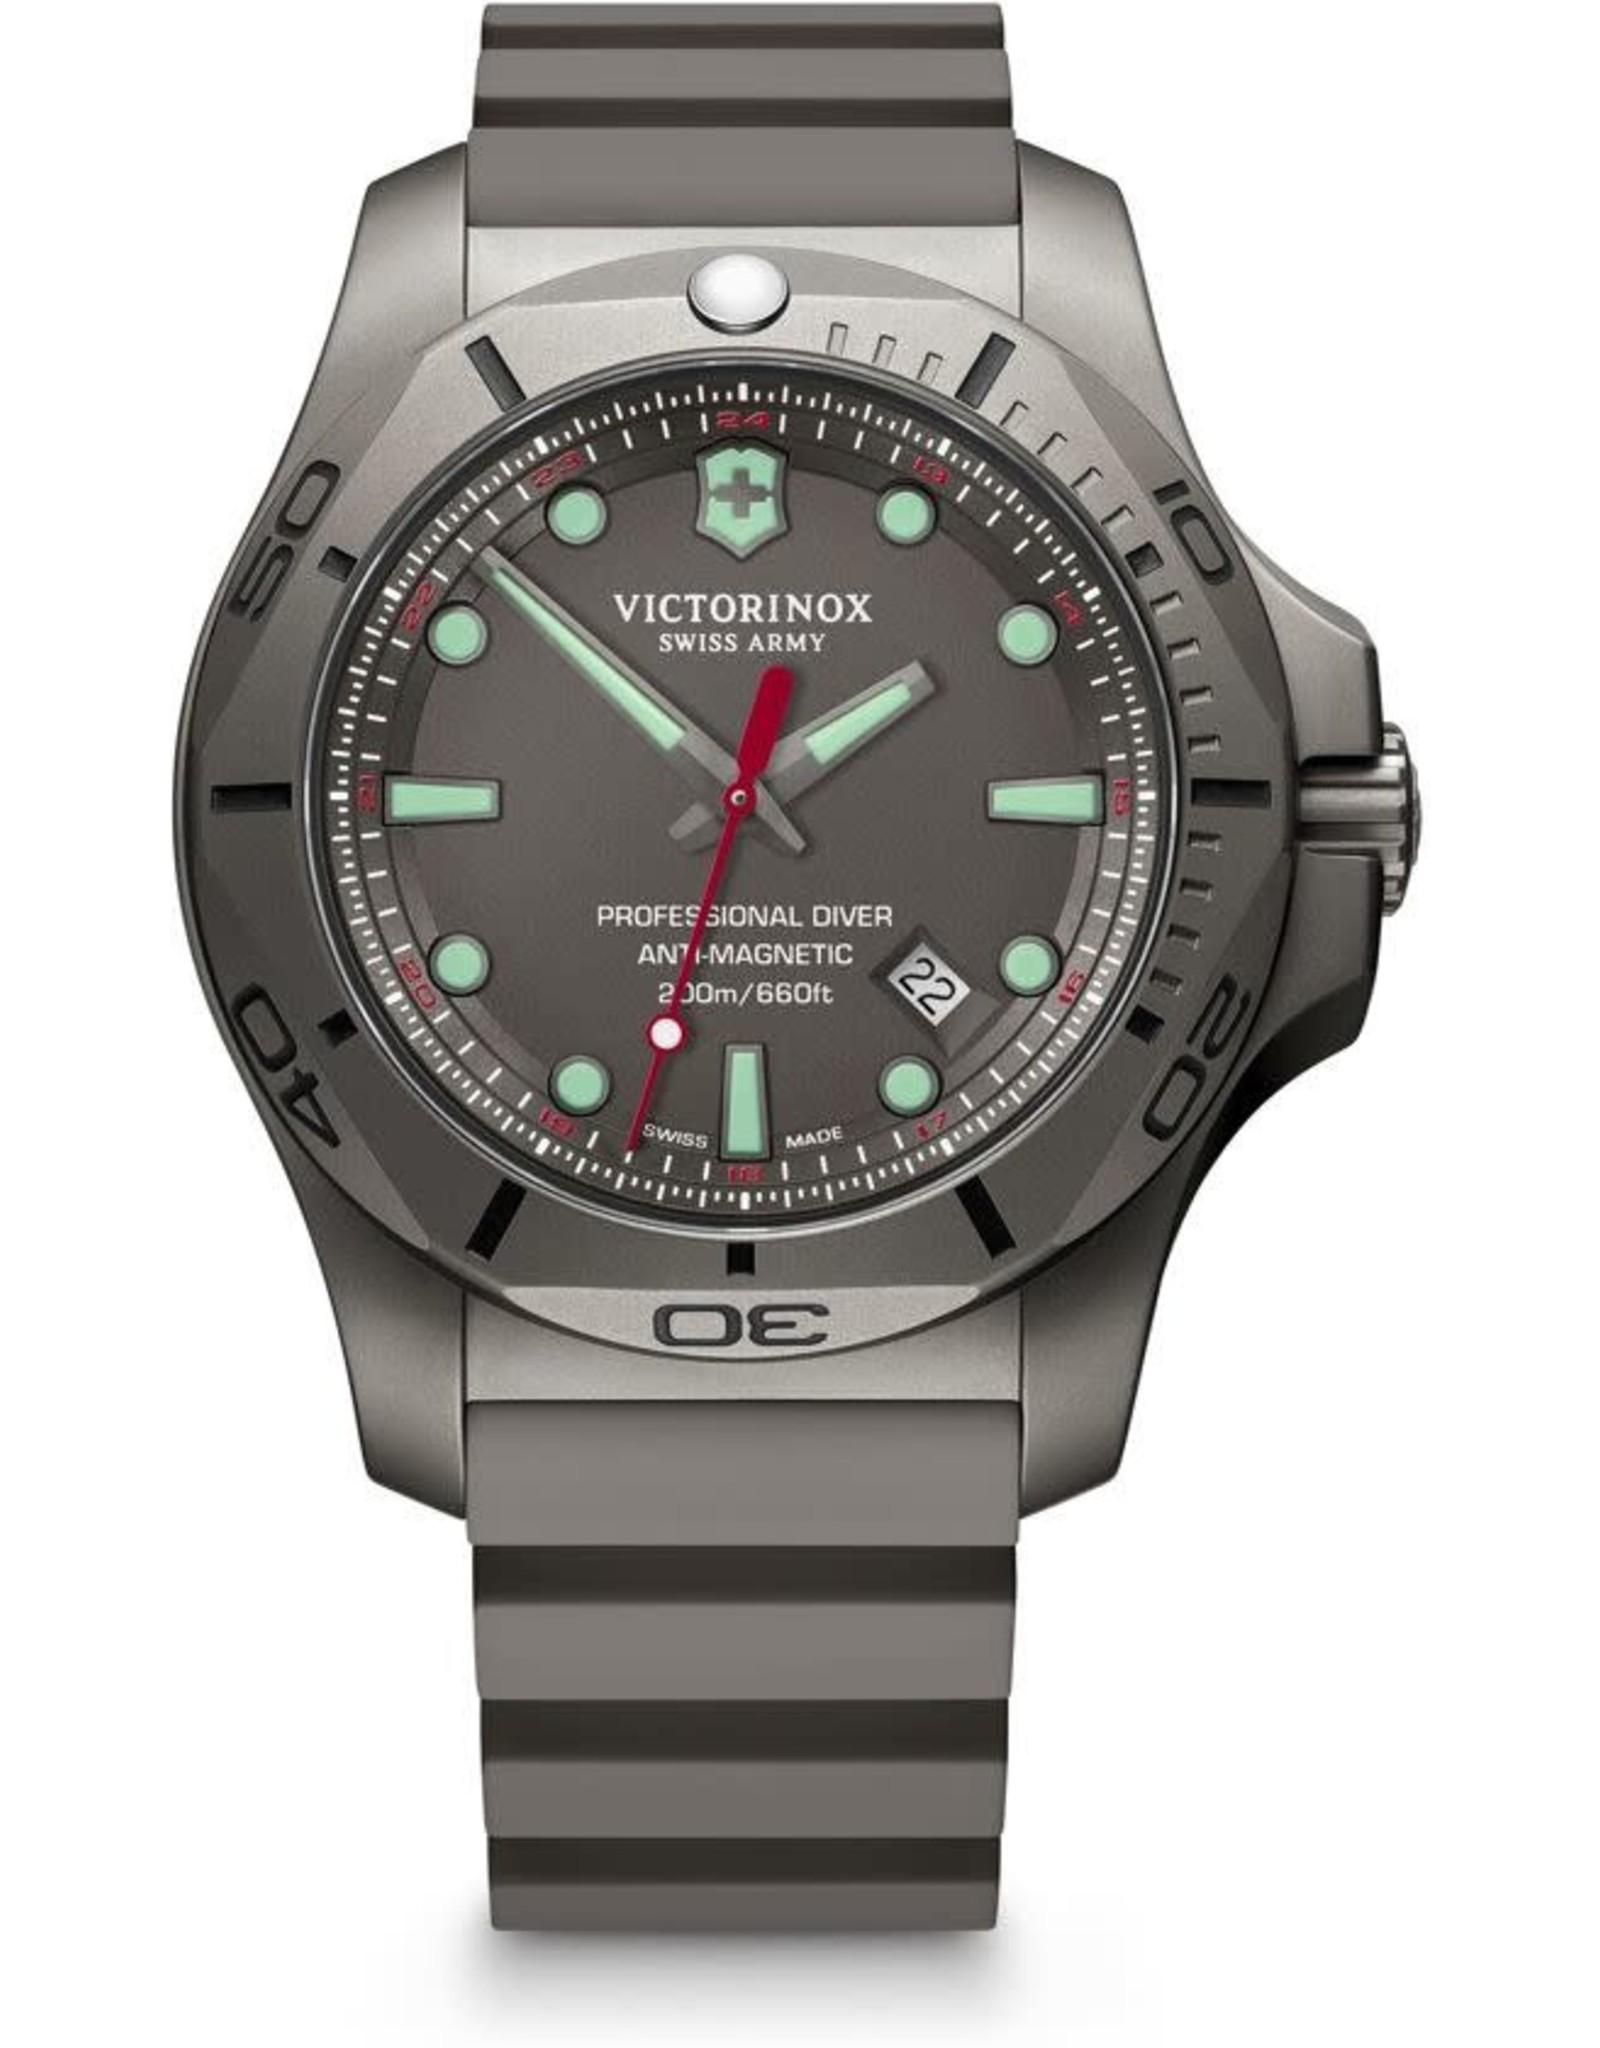 Victorinox Victorinox 241810 I.N.O.X Professional Diver 45mm